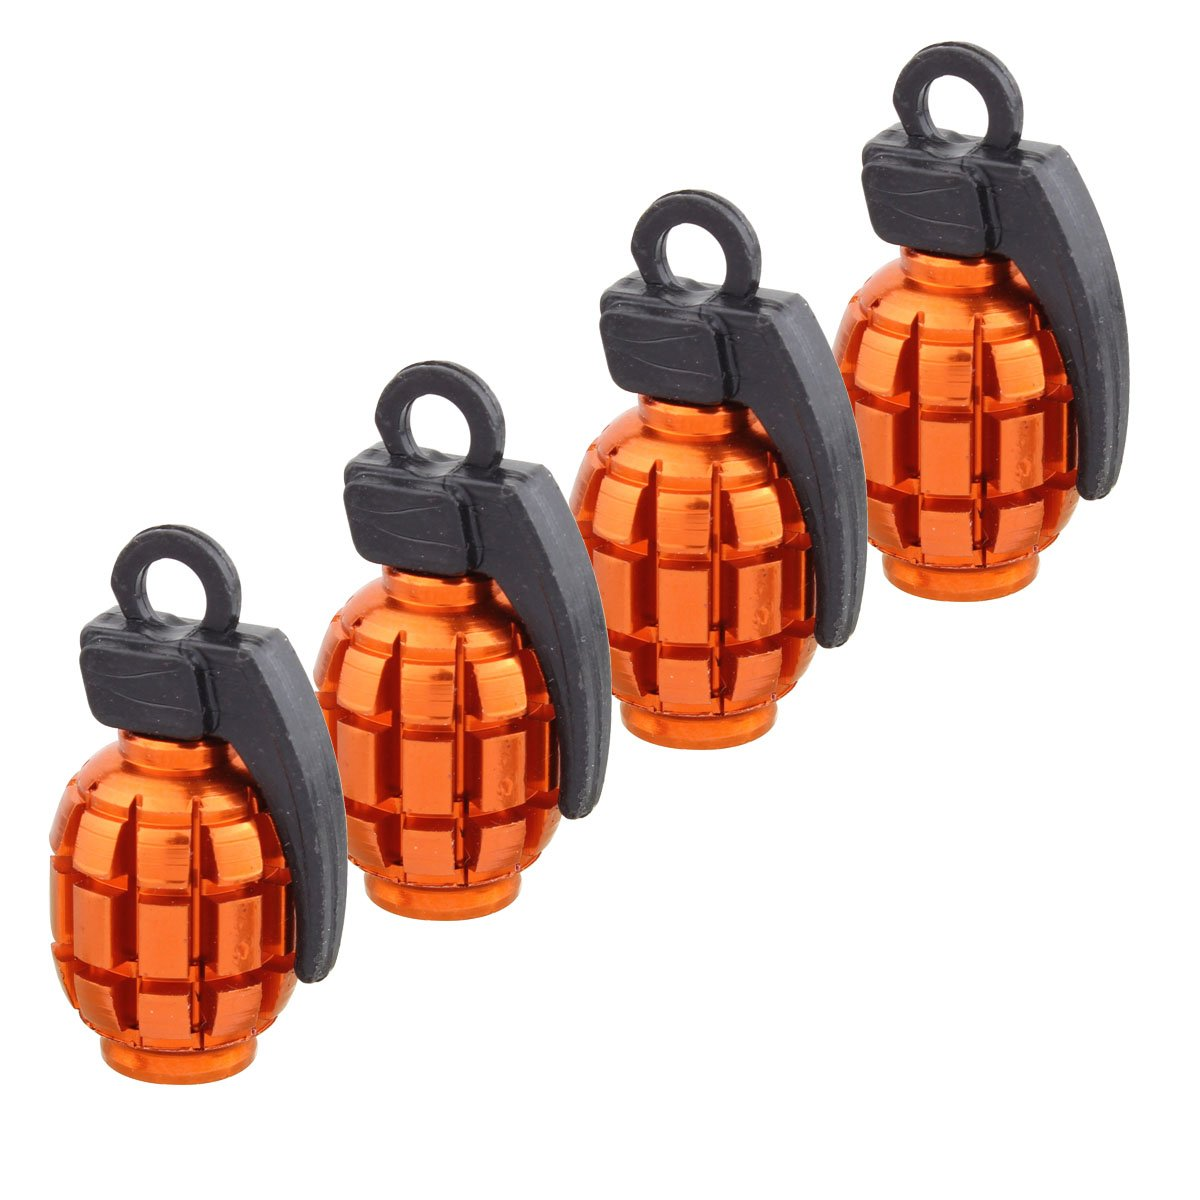 4 unids P/úrpura TOMALL Grenade Llantas Rueda V/álvula de Neum/ático Tapas Cubierta de Polvo de Aleaci/ón de Aluminio Cubierta de Polvo